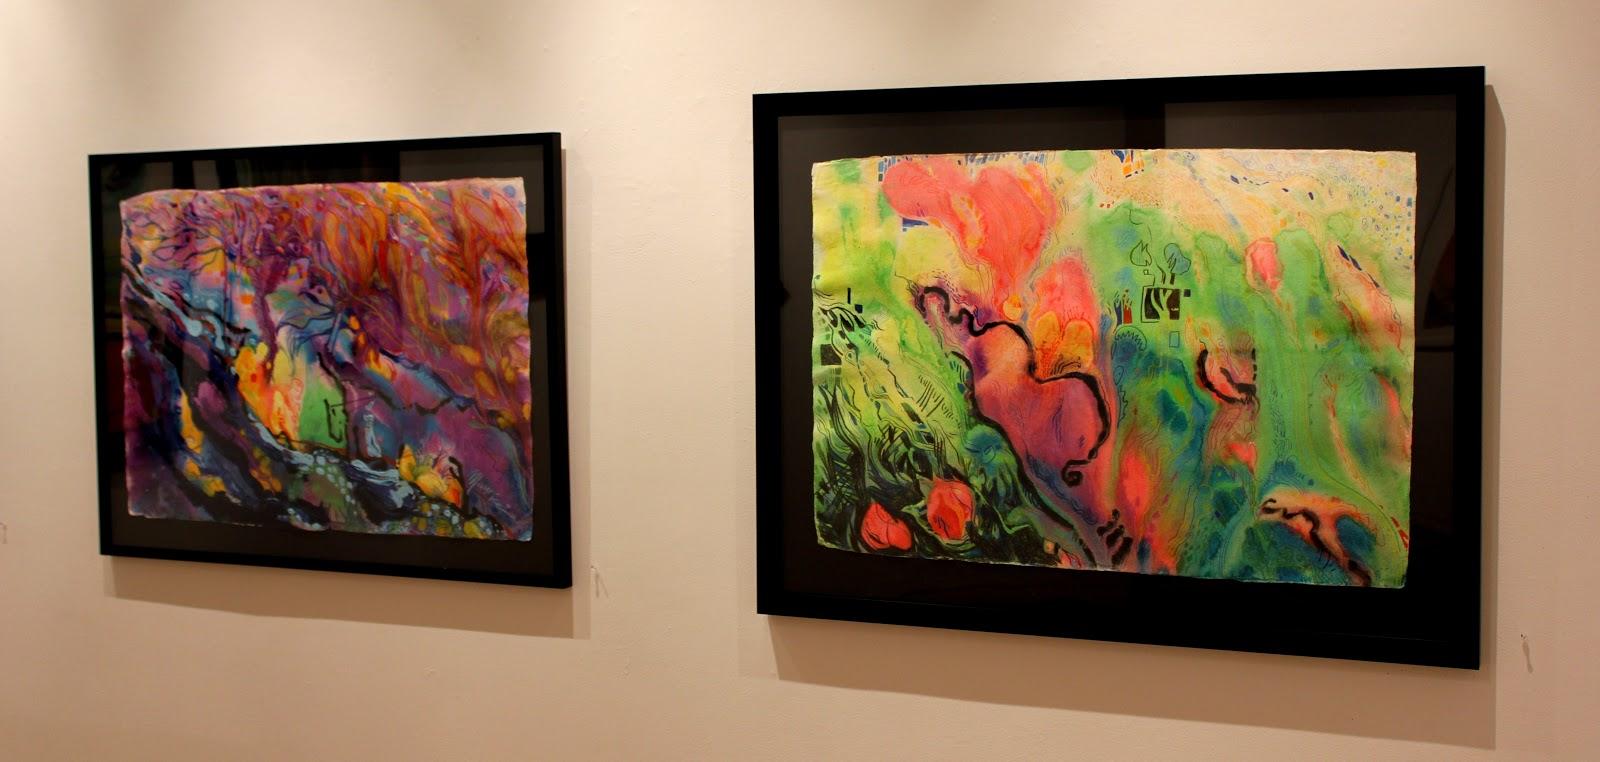 reflections on an art exhibit essay